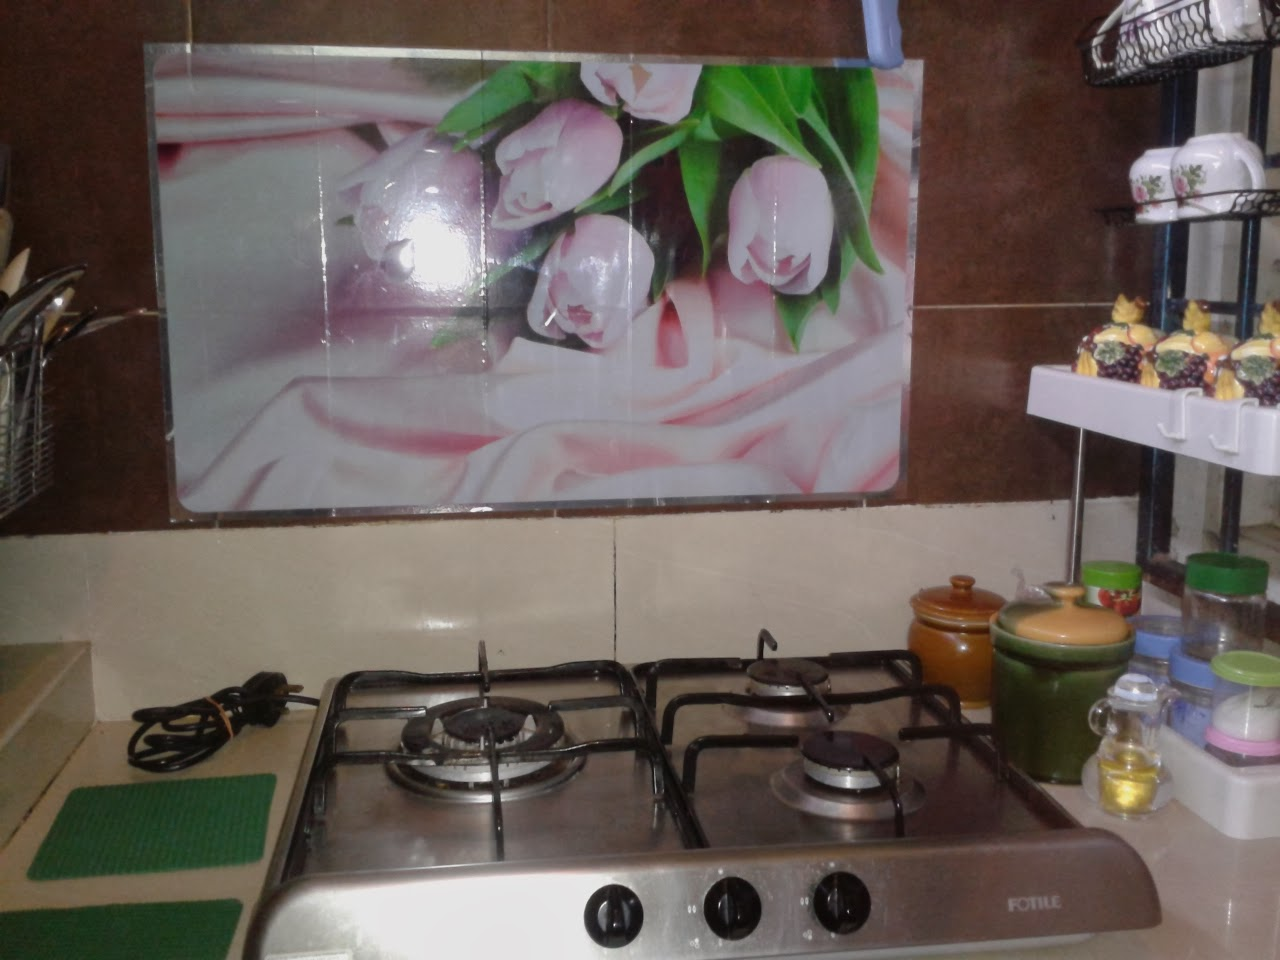 Dari Pintu Saja Dah Dapat Lihat Bunga Tulip Tu Ceria Sikit Dapur Yang Selama Gelap